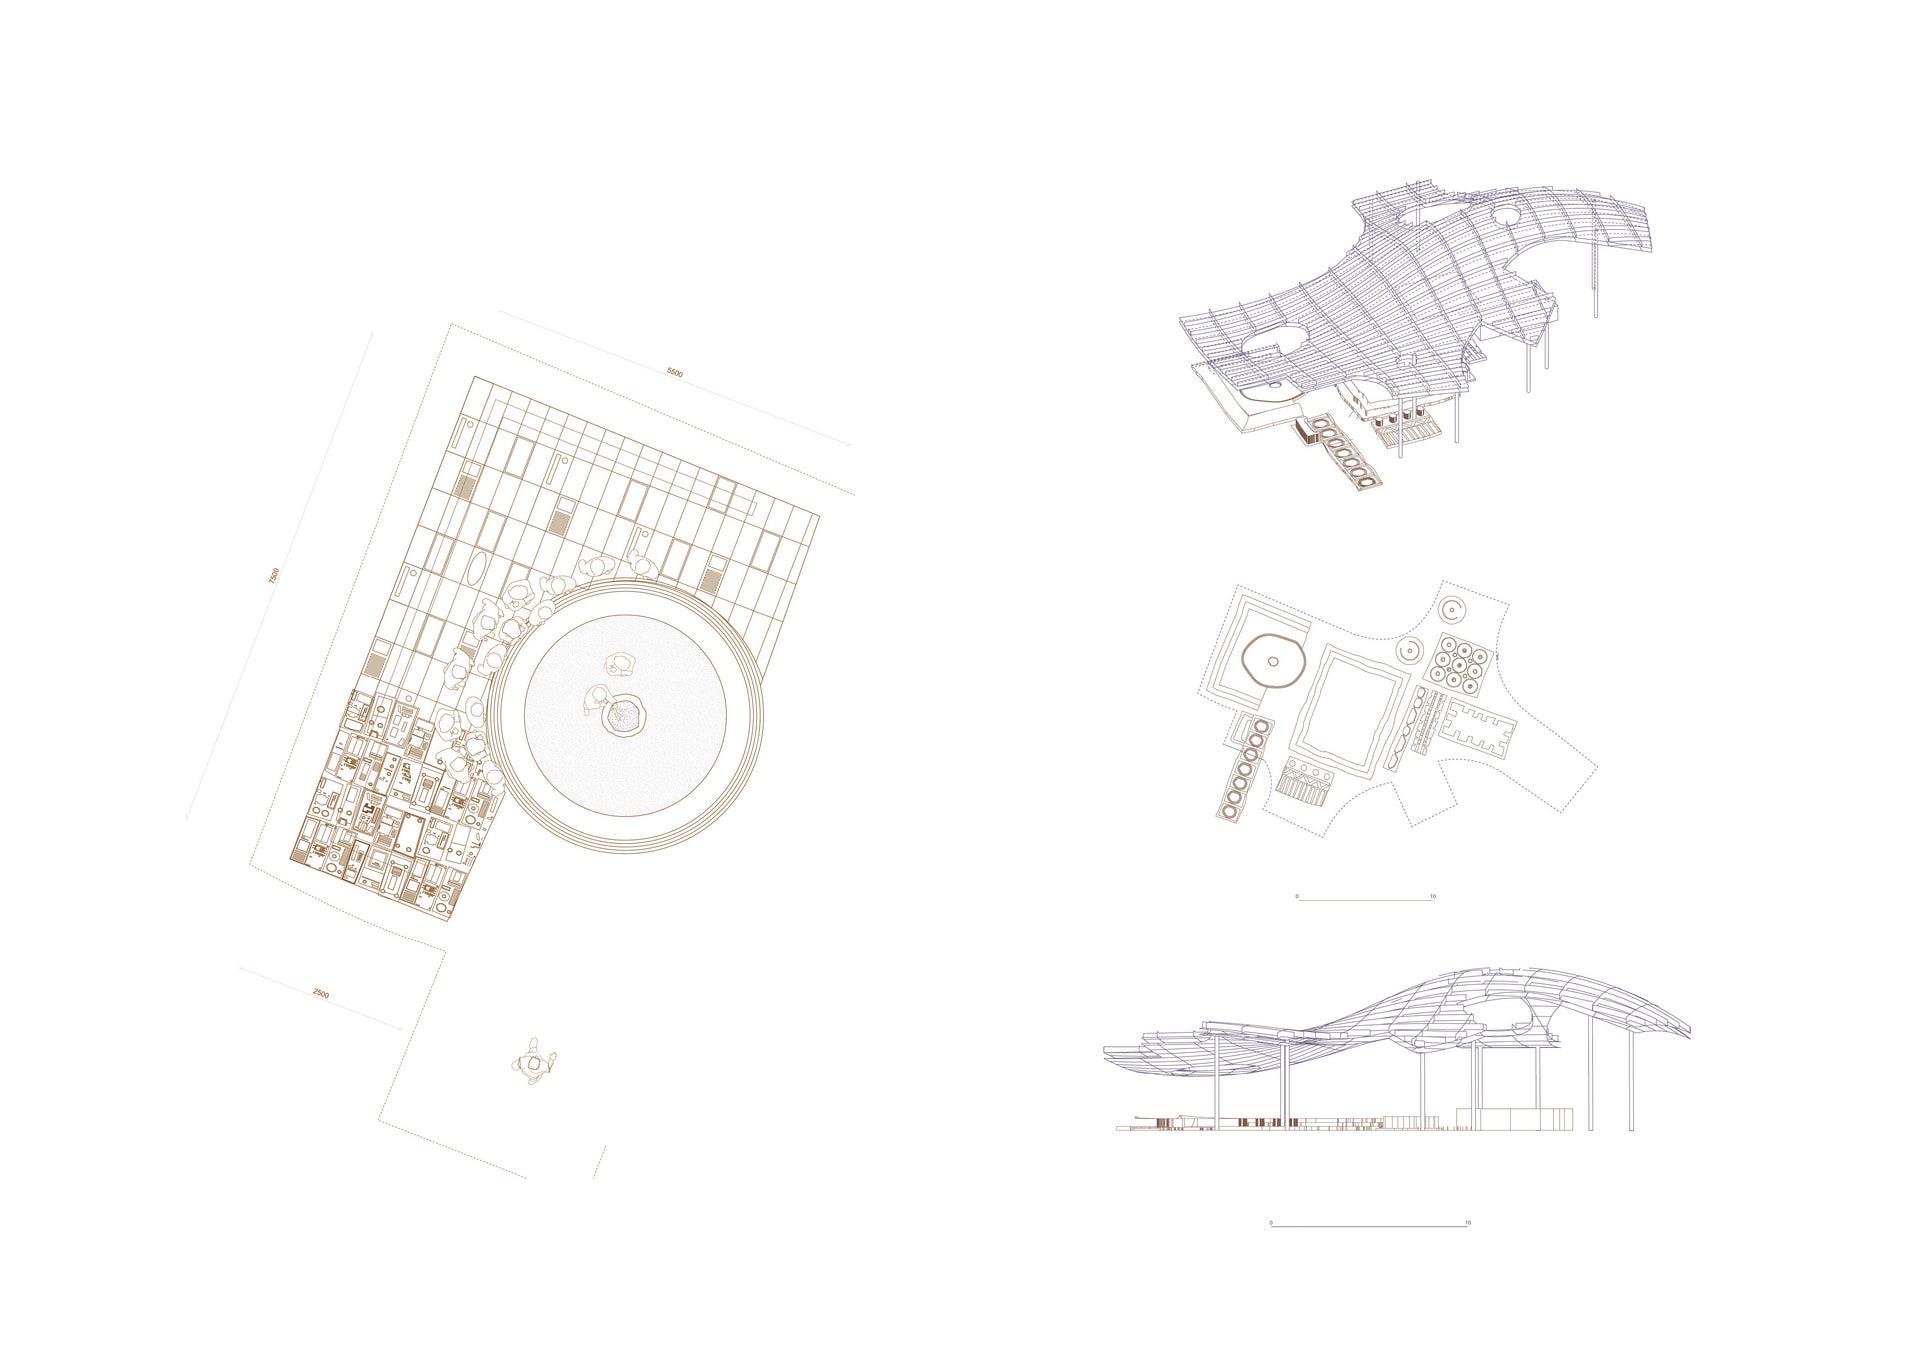 Ceremony Plinth - Design development